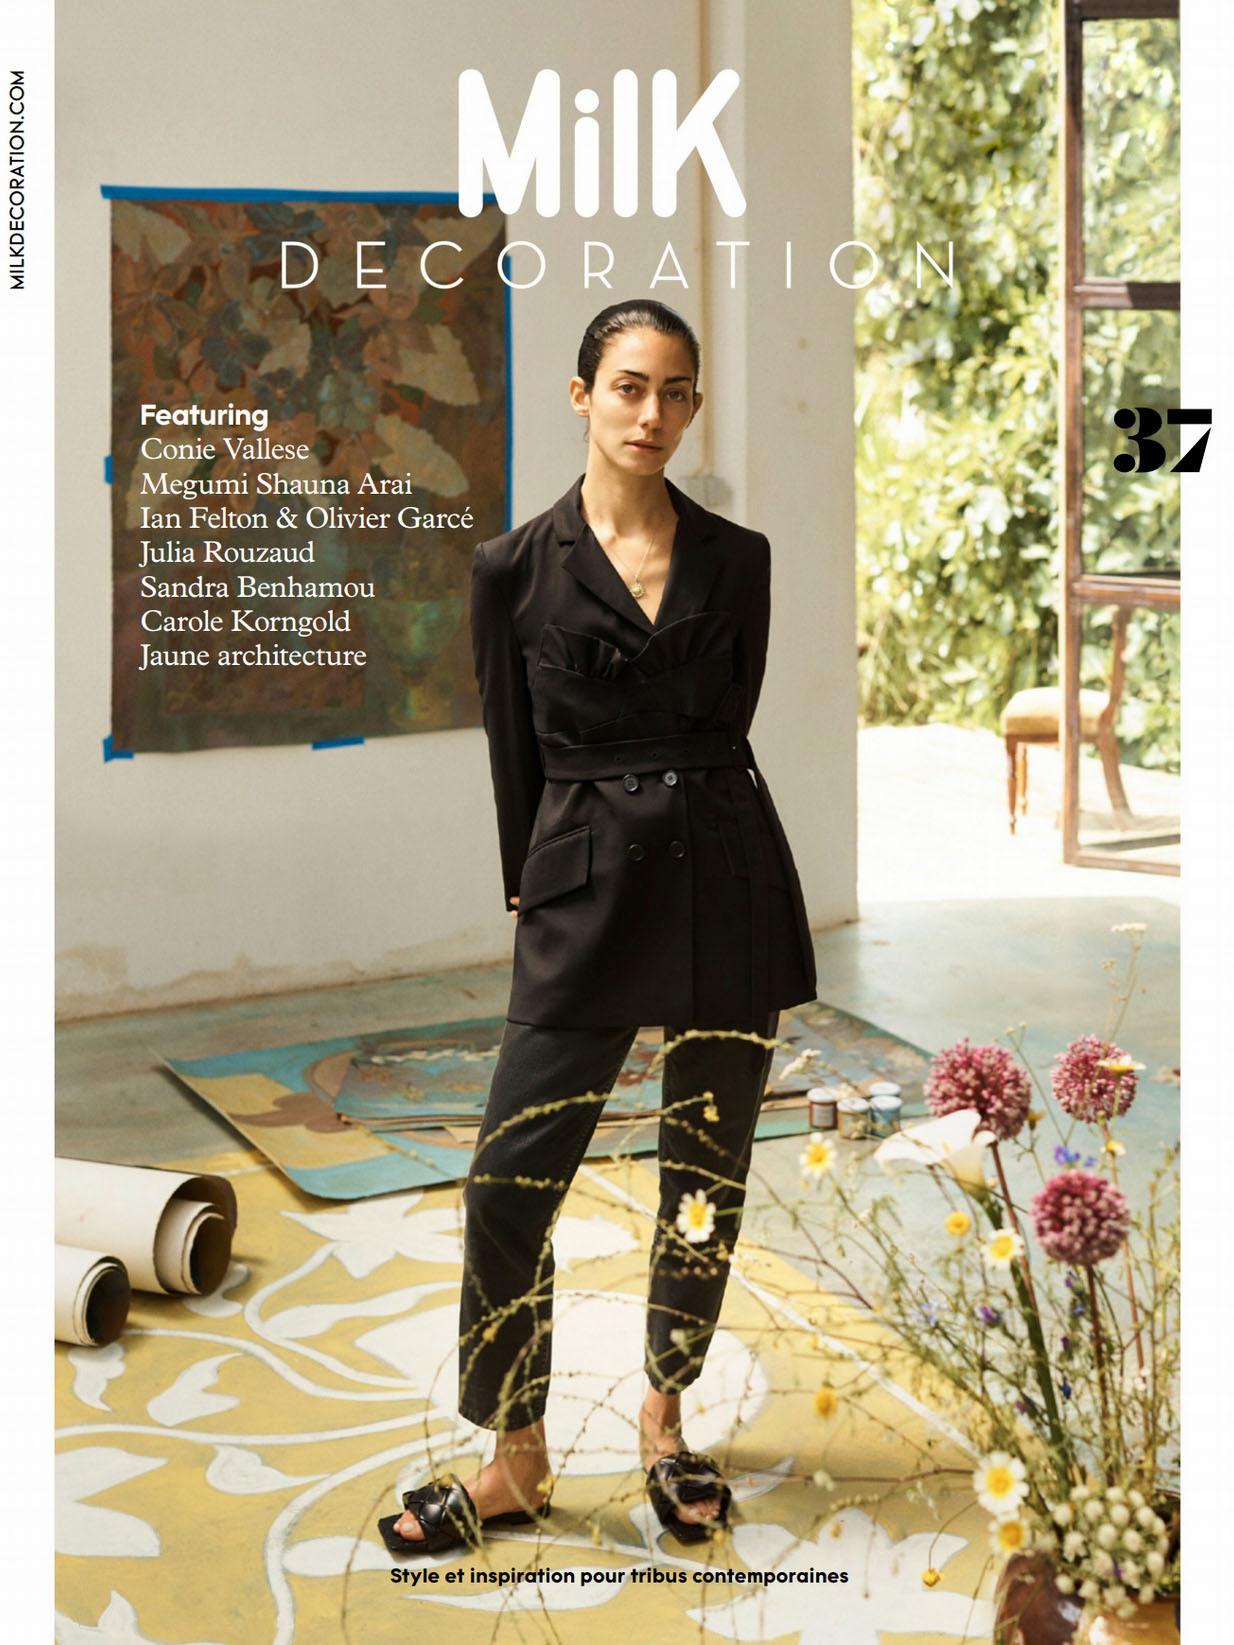 《Milk Decoration》法国家庭生活杂志2021年09-11月号#37